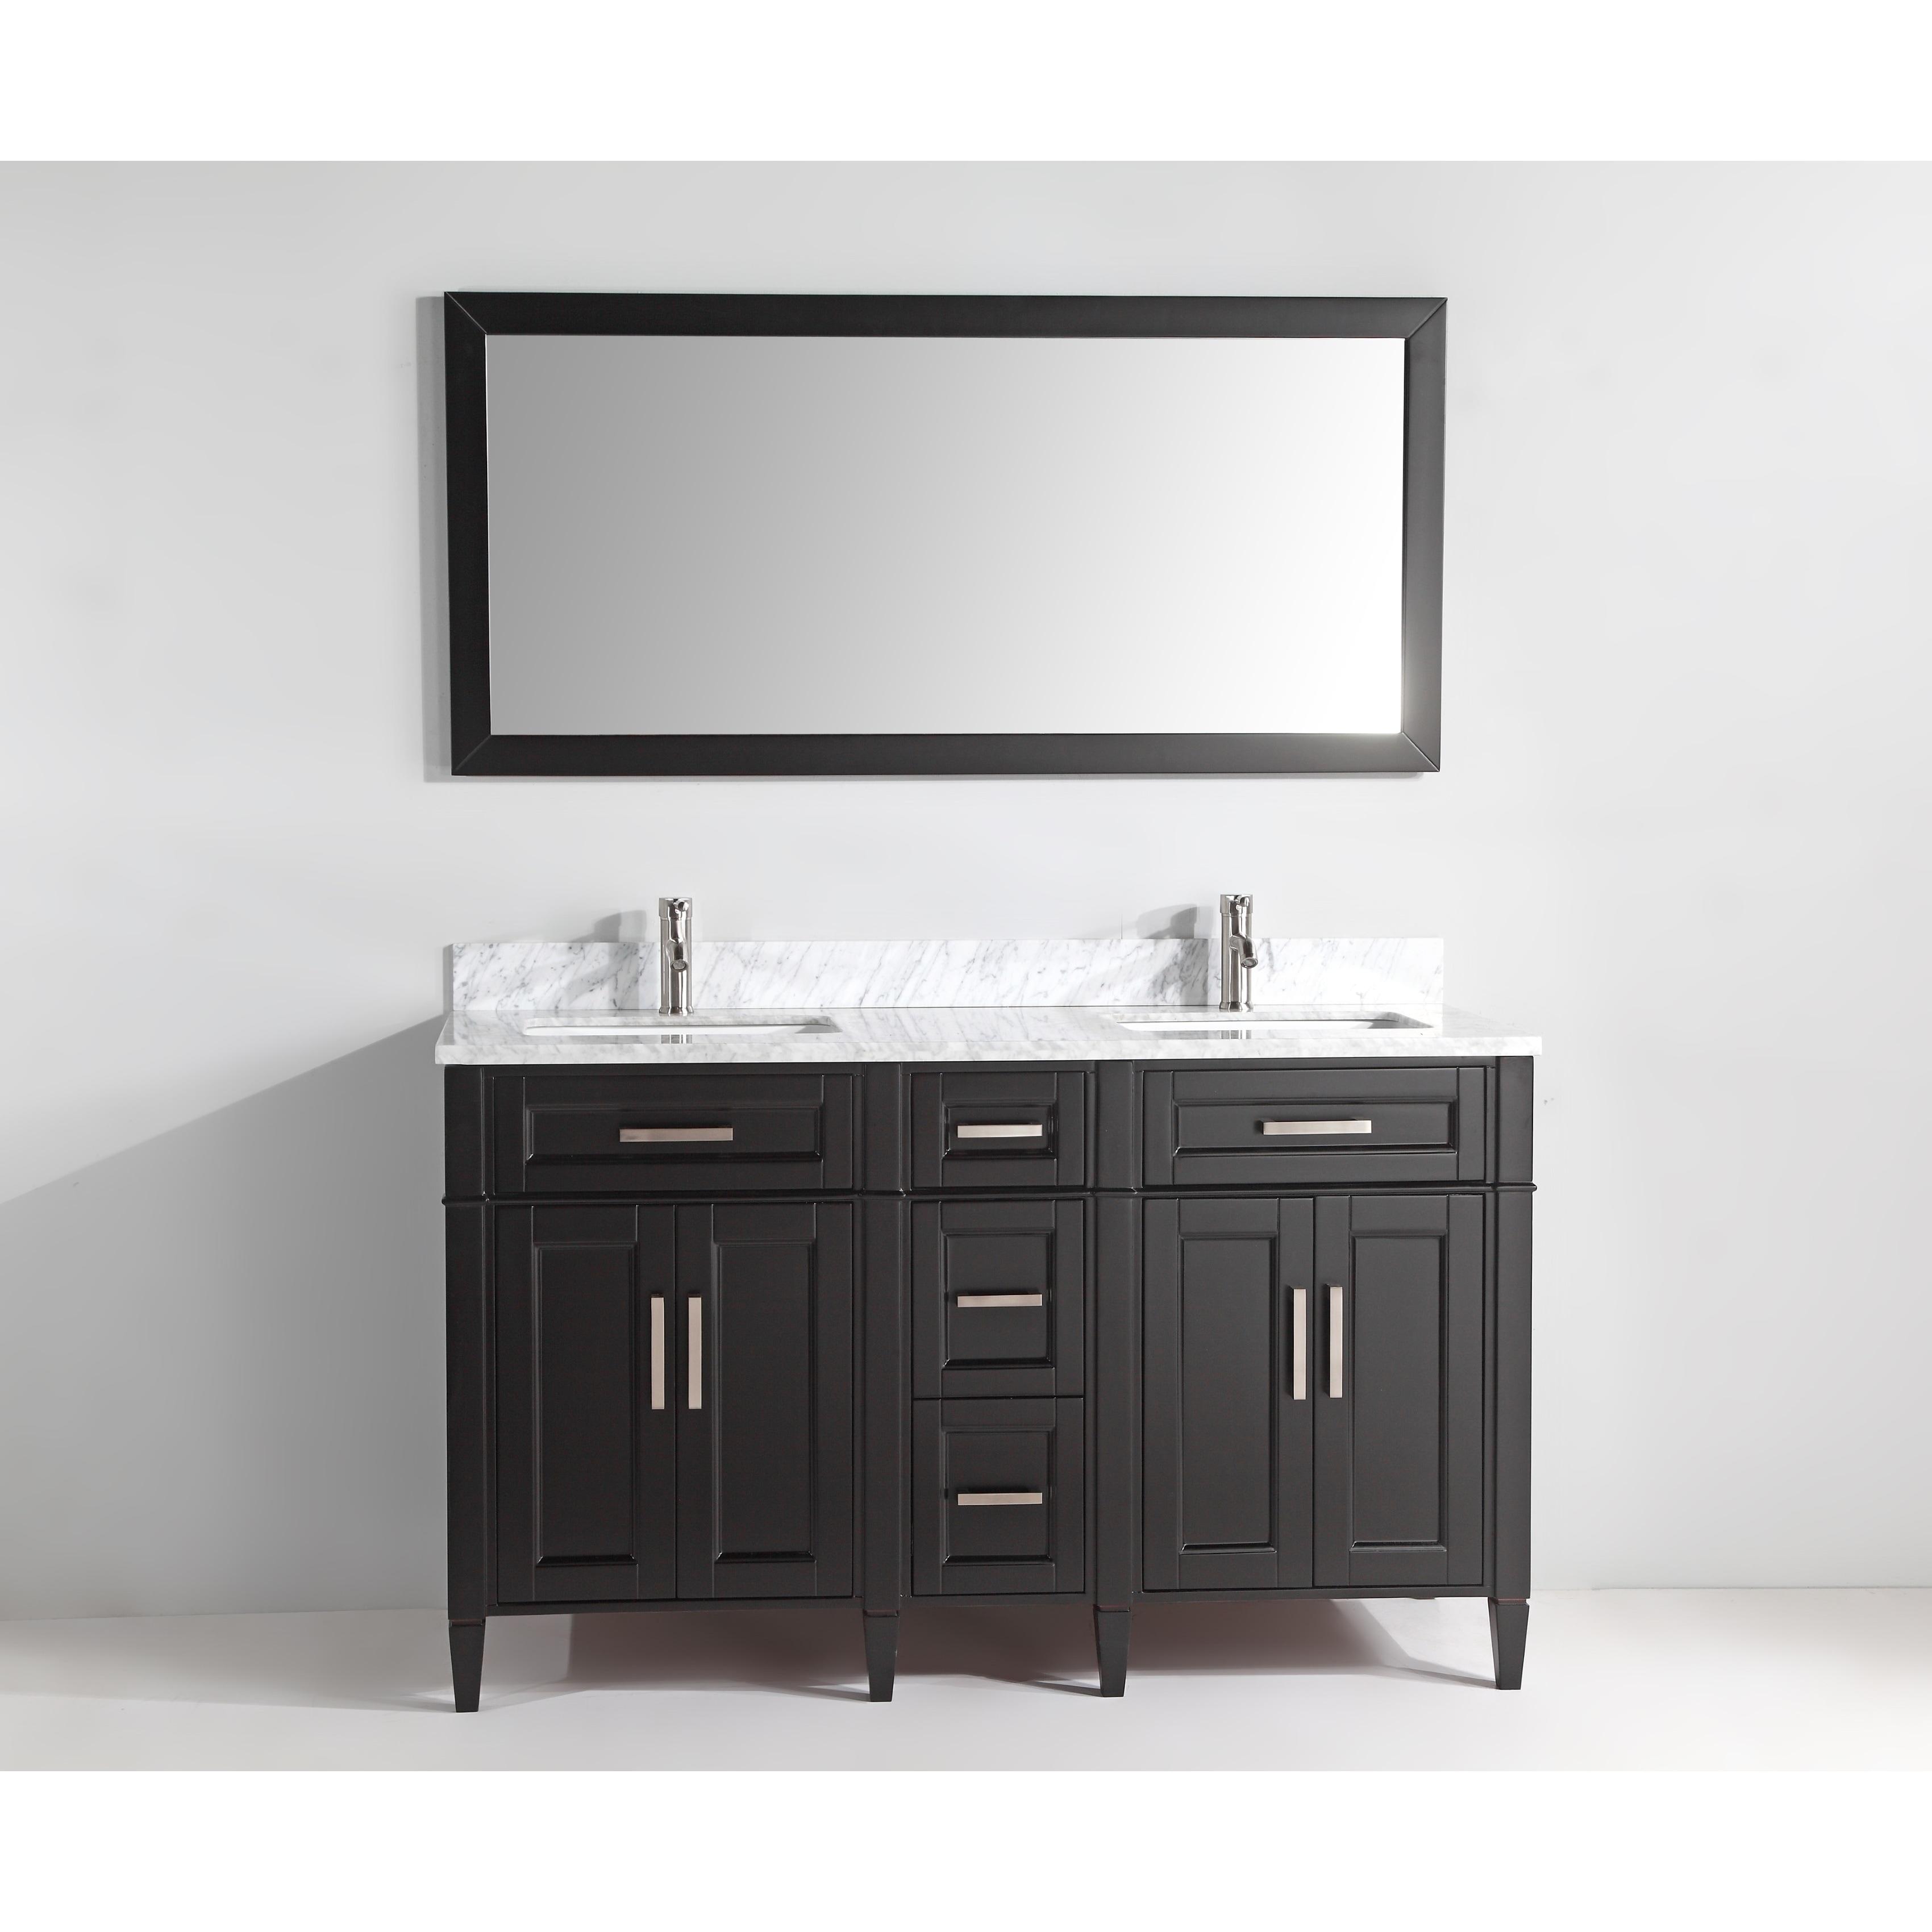 Shop Vanity Art 60 Inch Bathroom Vanity Set With Carrara Marble Top